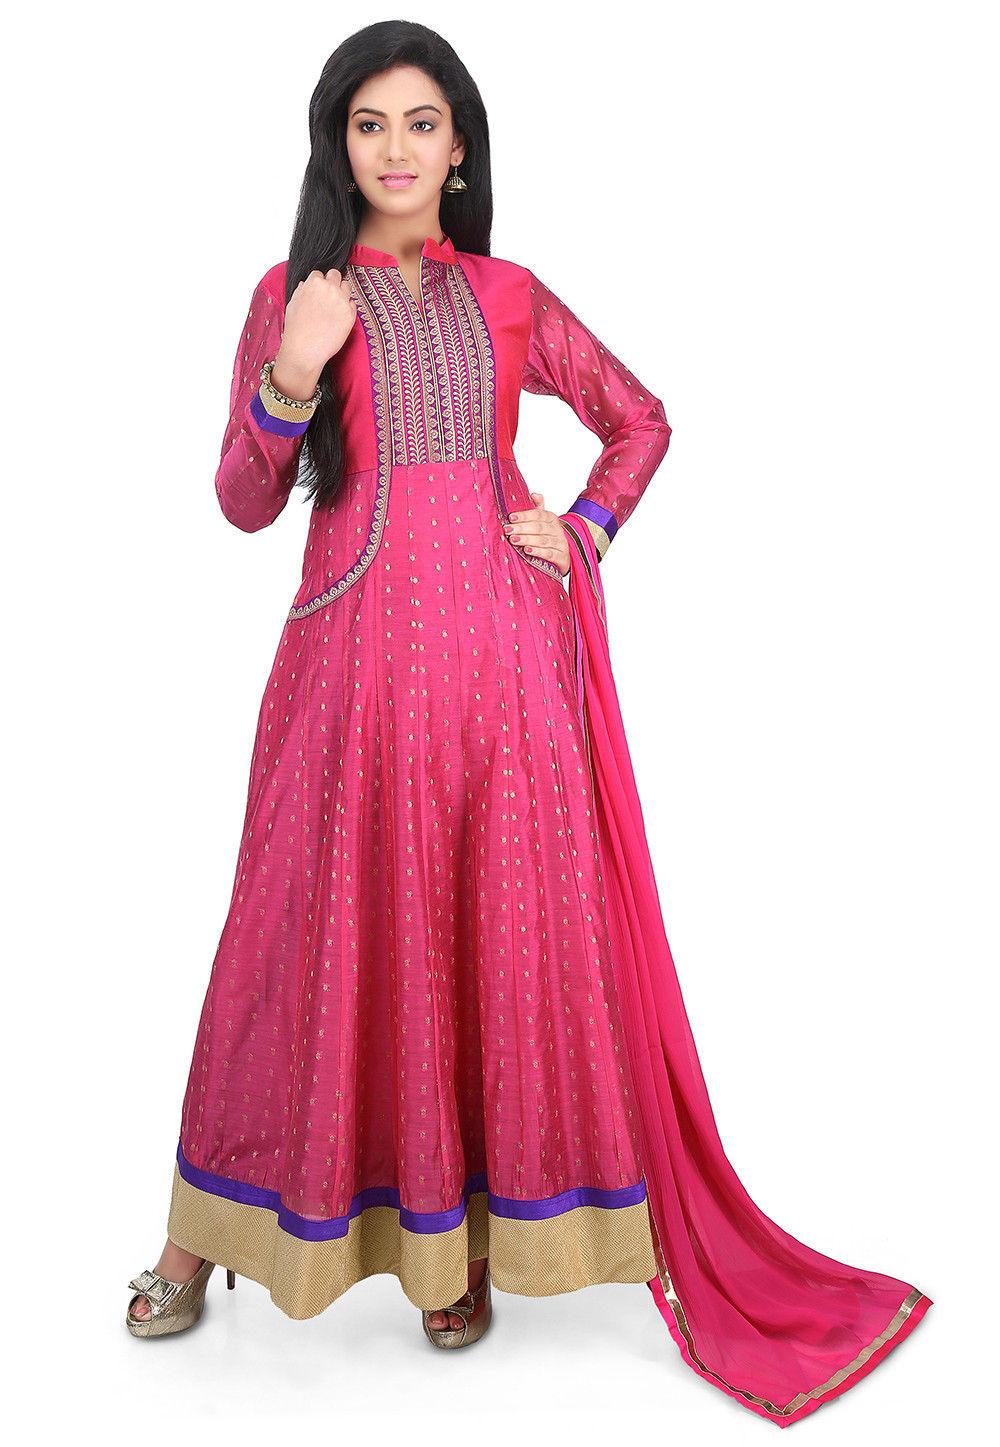 Woven Art Chanderi Silk Jacquard Abaya Style Suit in Fuchsia